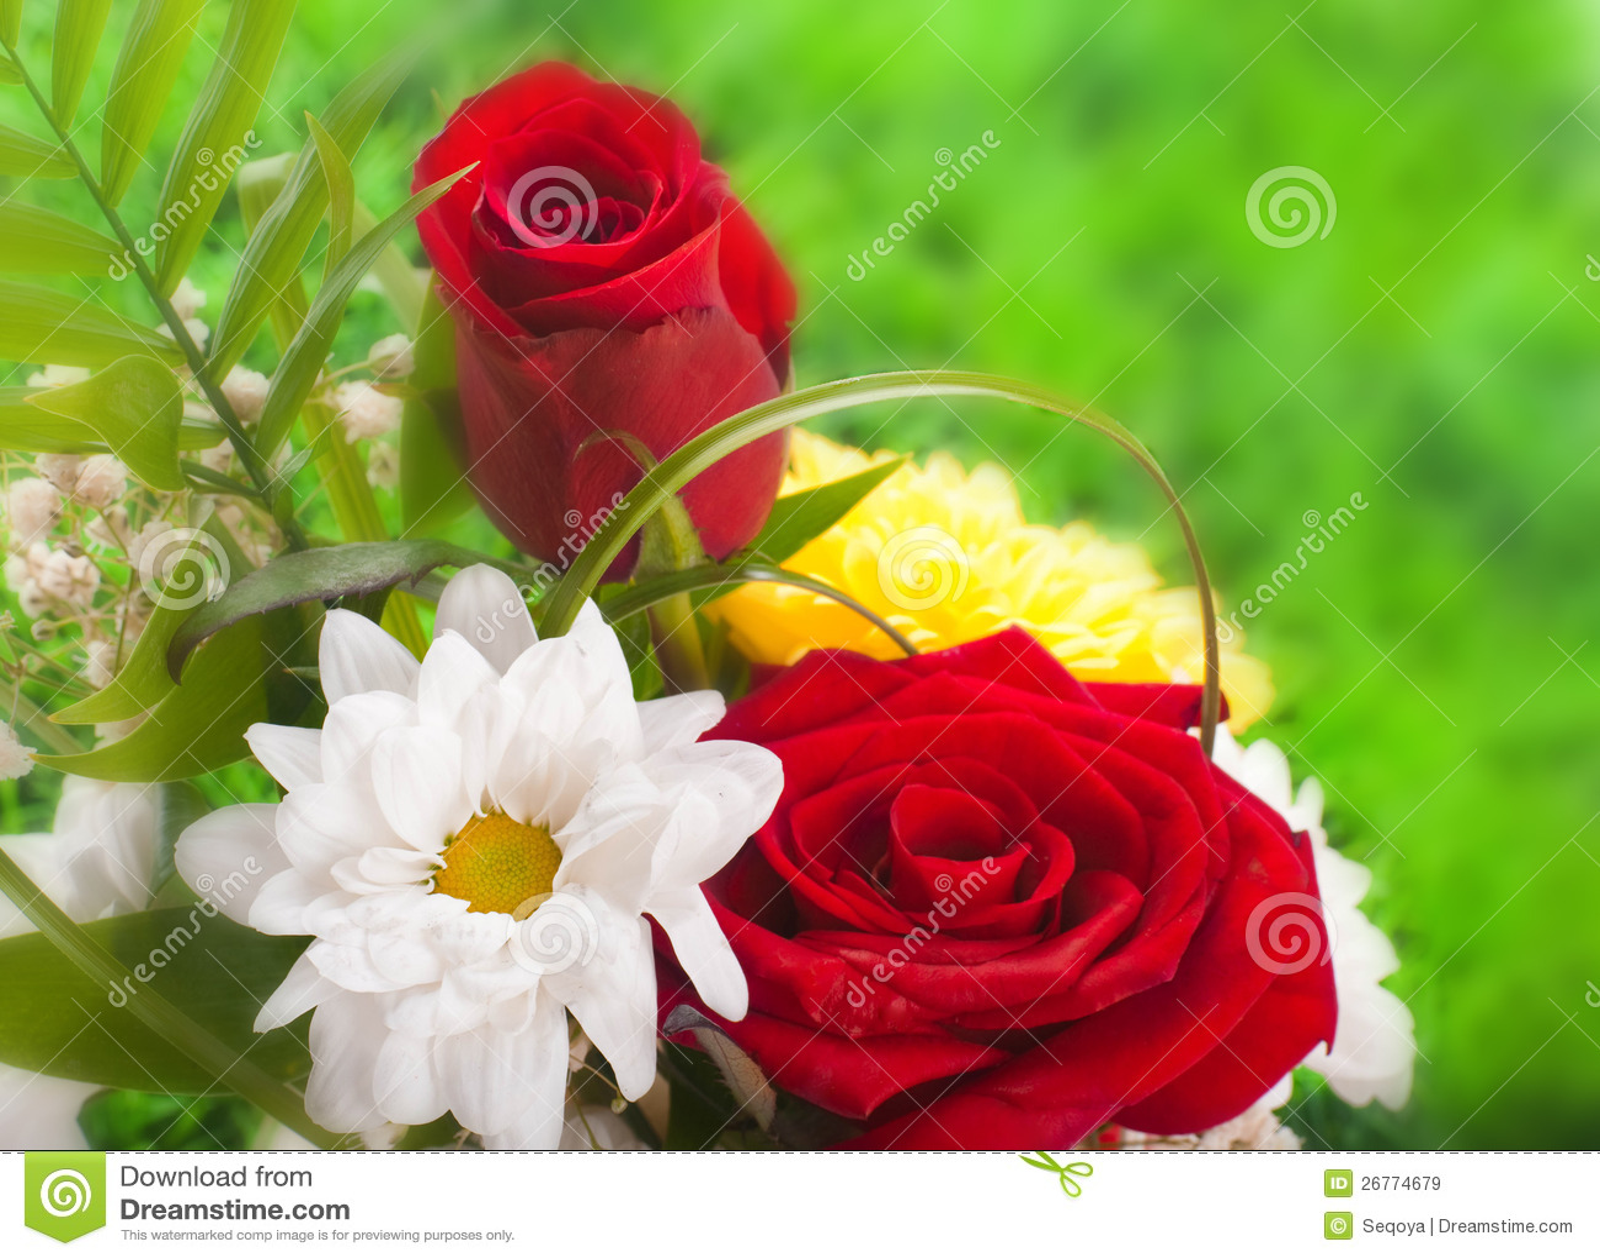 Rosas hermosas en estilo retro imagen de archivo imagen - Rosas rosas hermosas ...